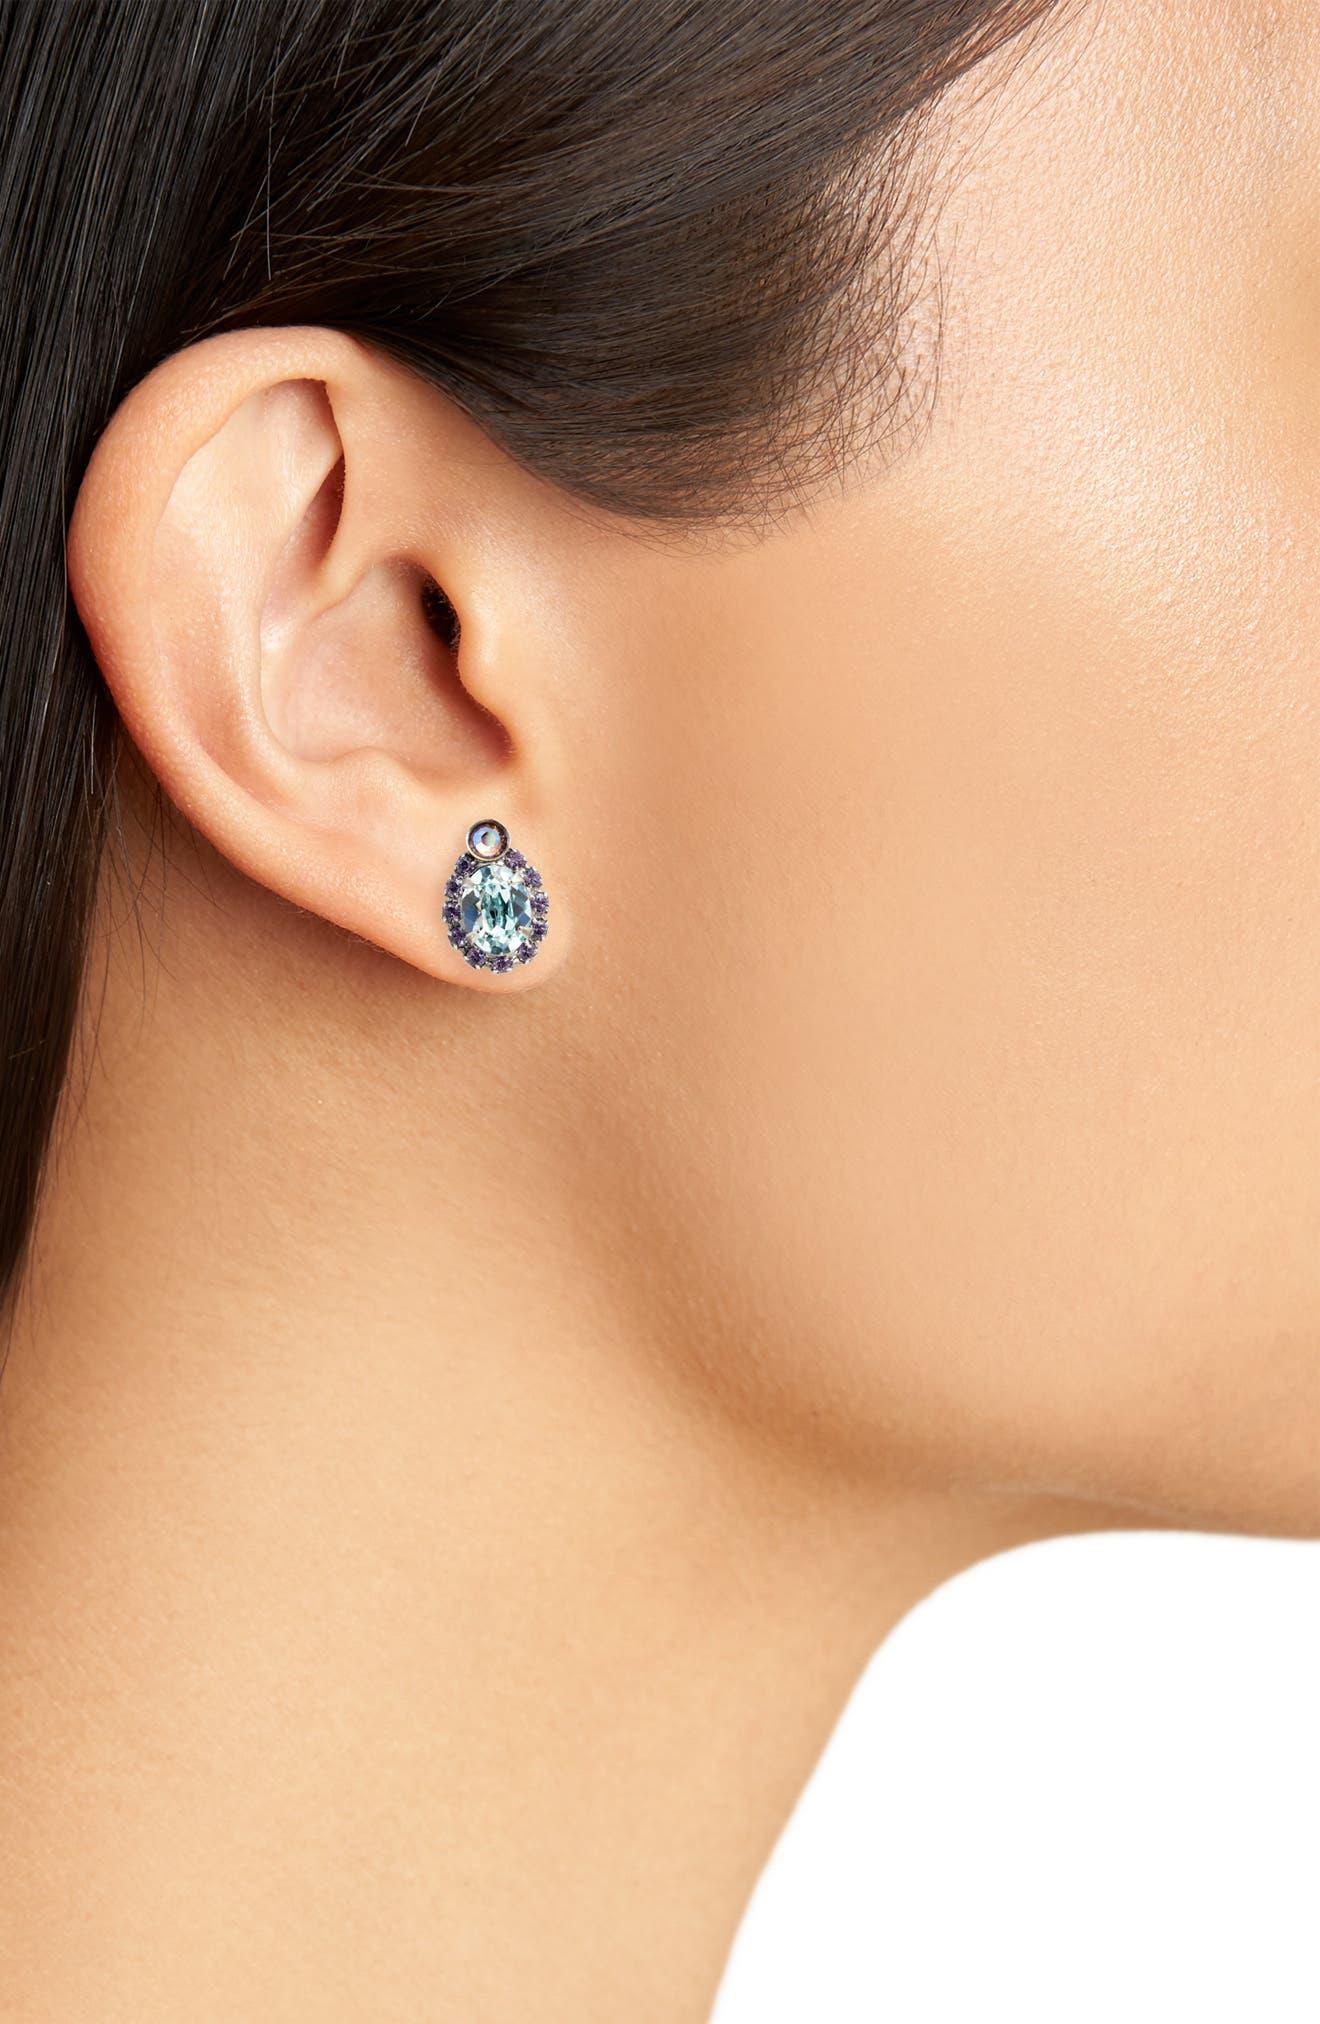 Pansy Crystal Earrings,                             Alternate thumbnail 2, color,                             Blue